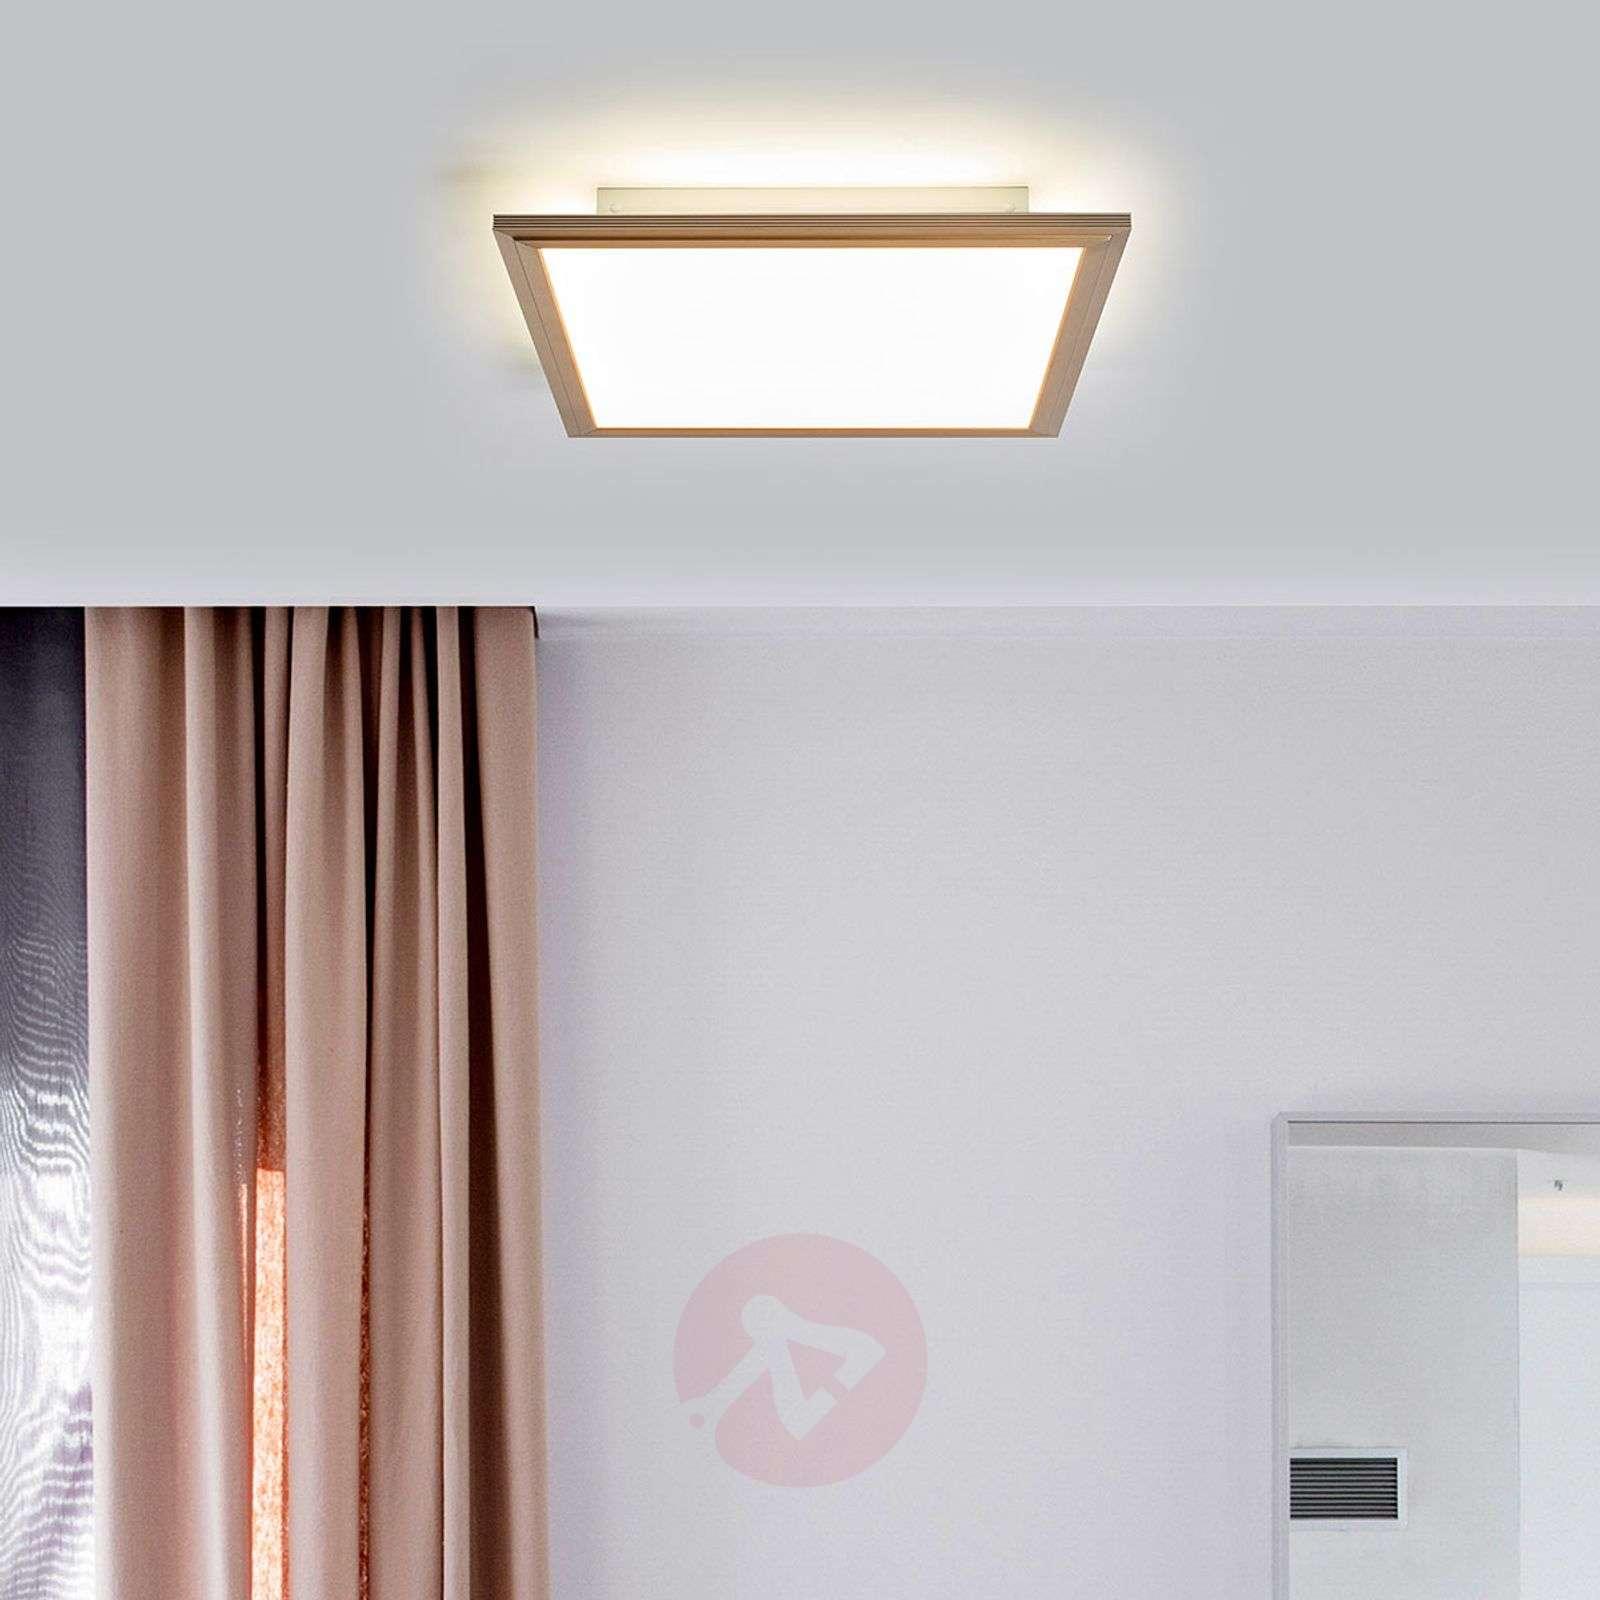 LED-kattovalaisin Corinna, 2700-6200K, 35x35cm-1558121-03